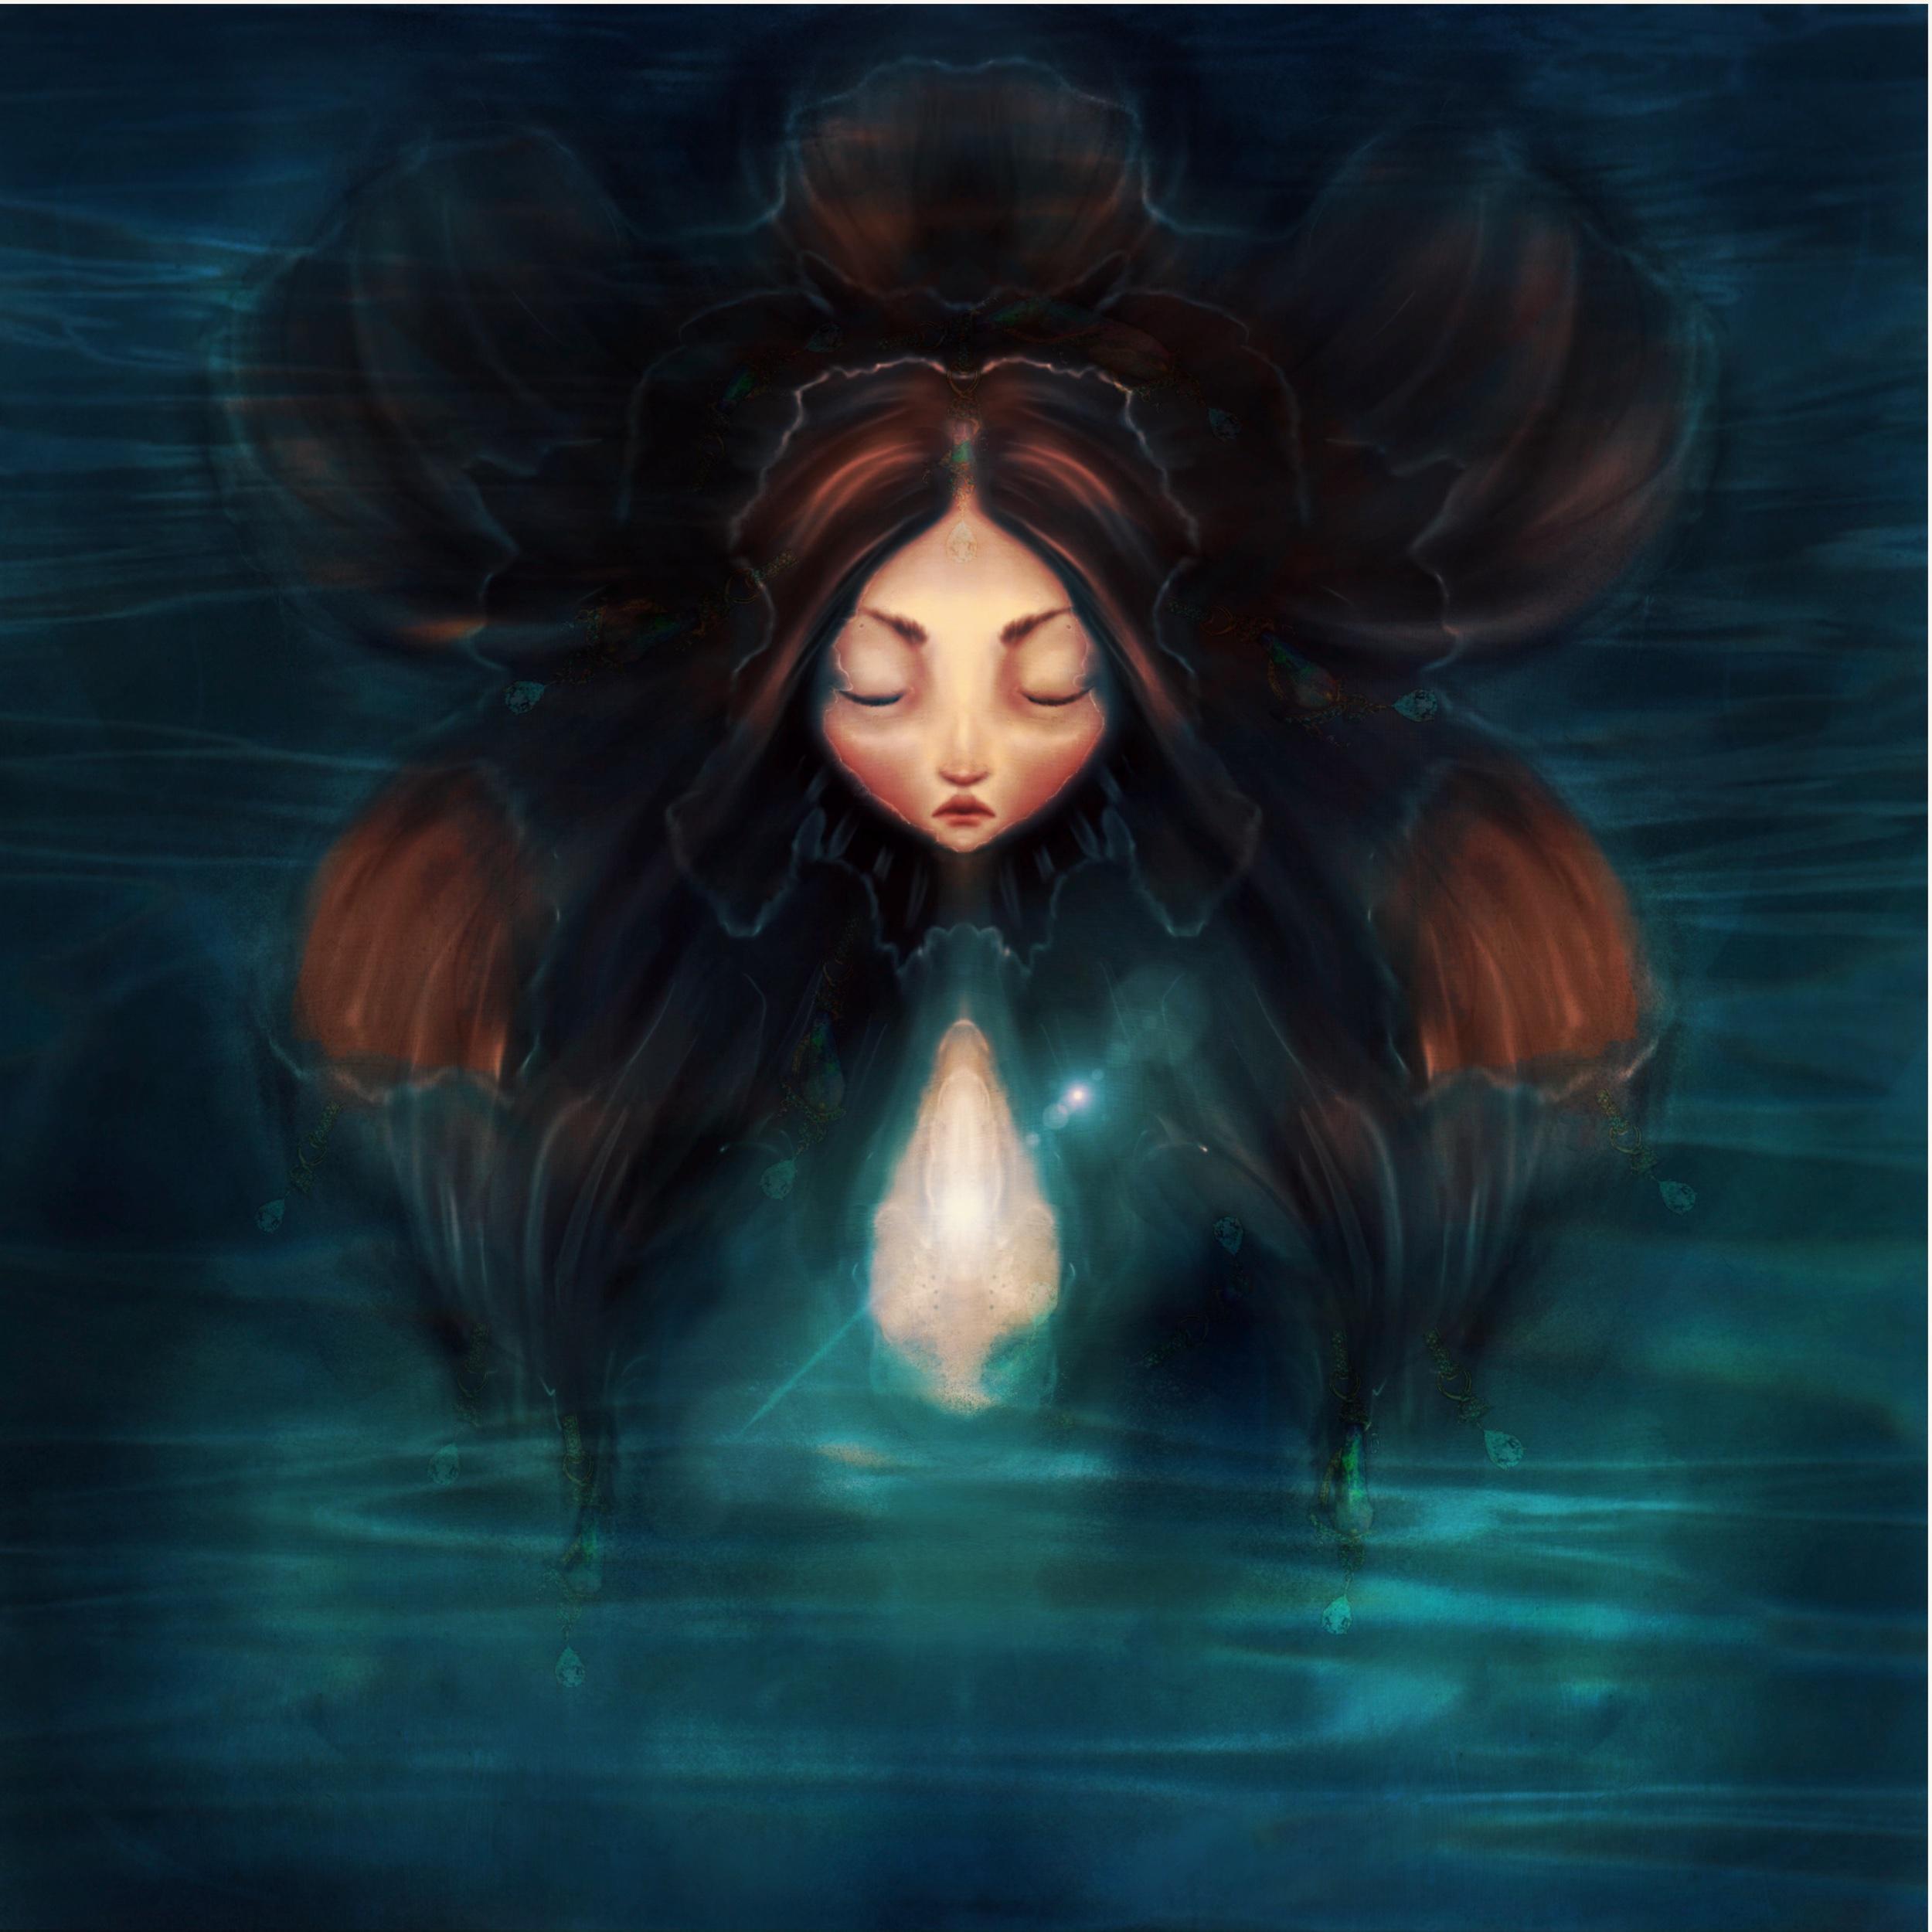 mermaid-brown-hair-face above water opal headband.jpeg